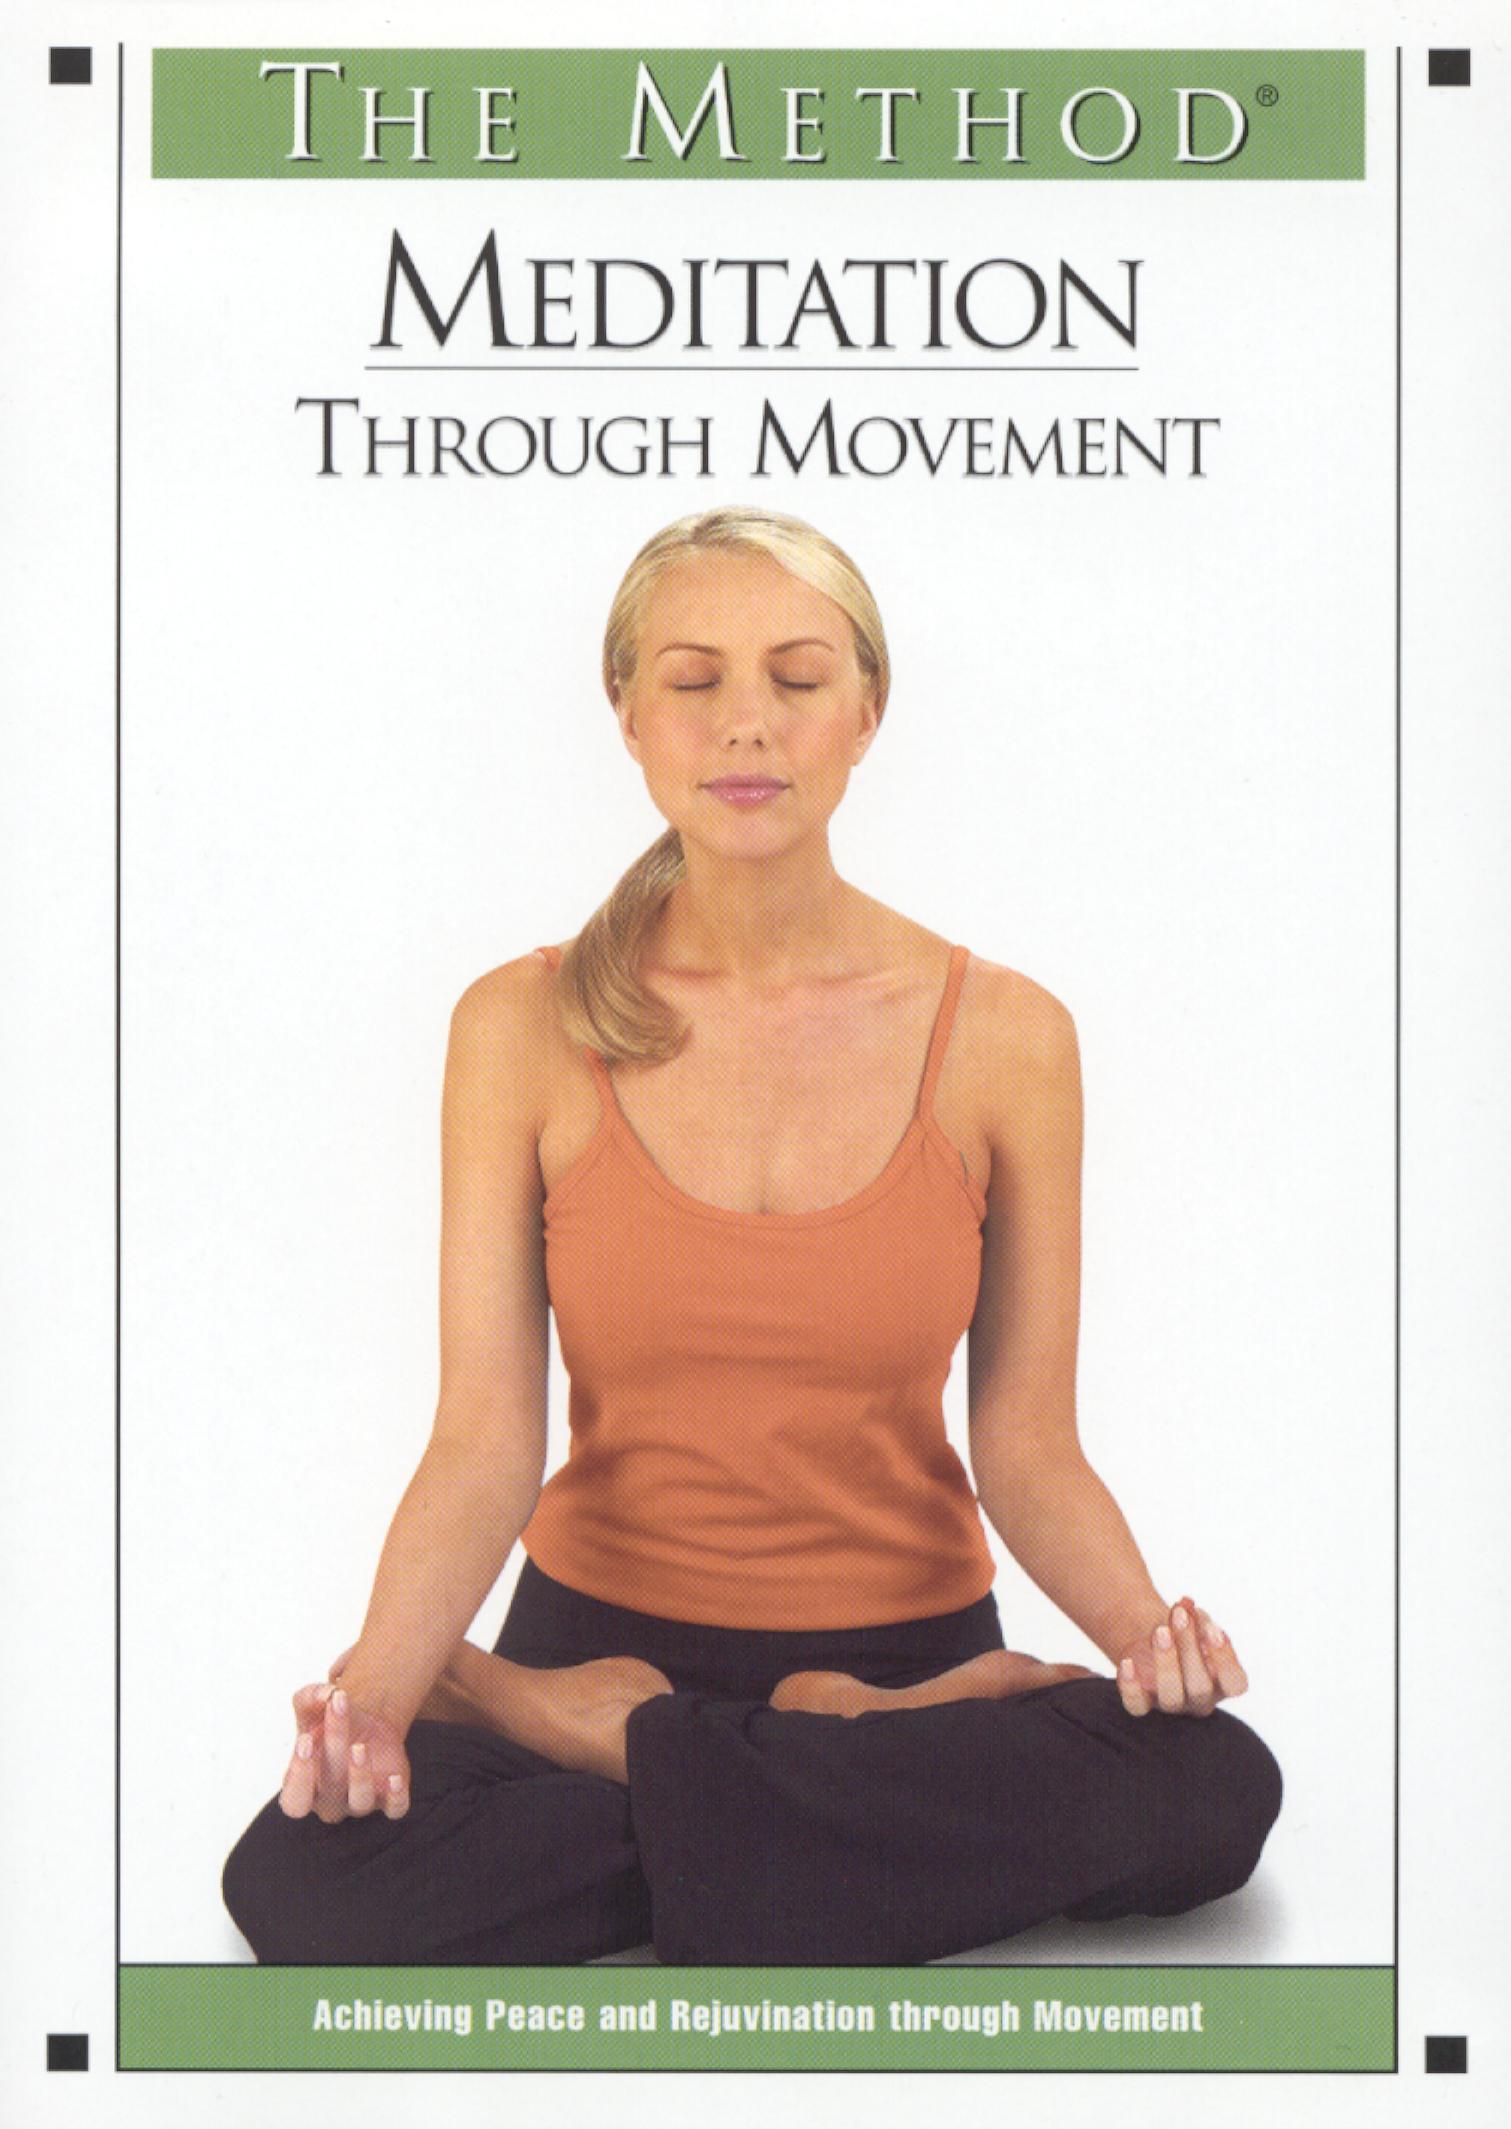 The Method: Meditation Through Movement